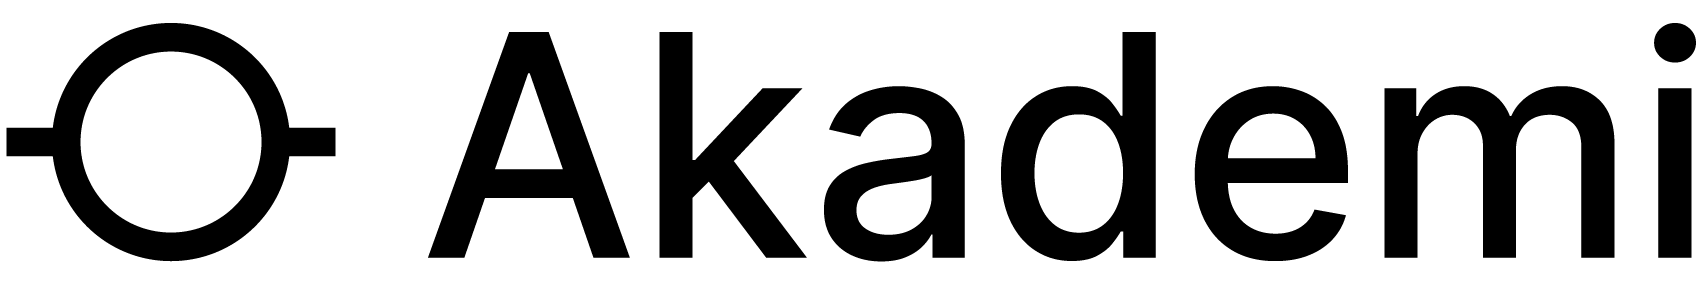 akademi-model-logo